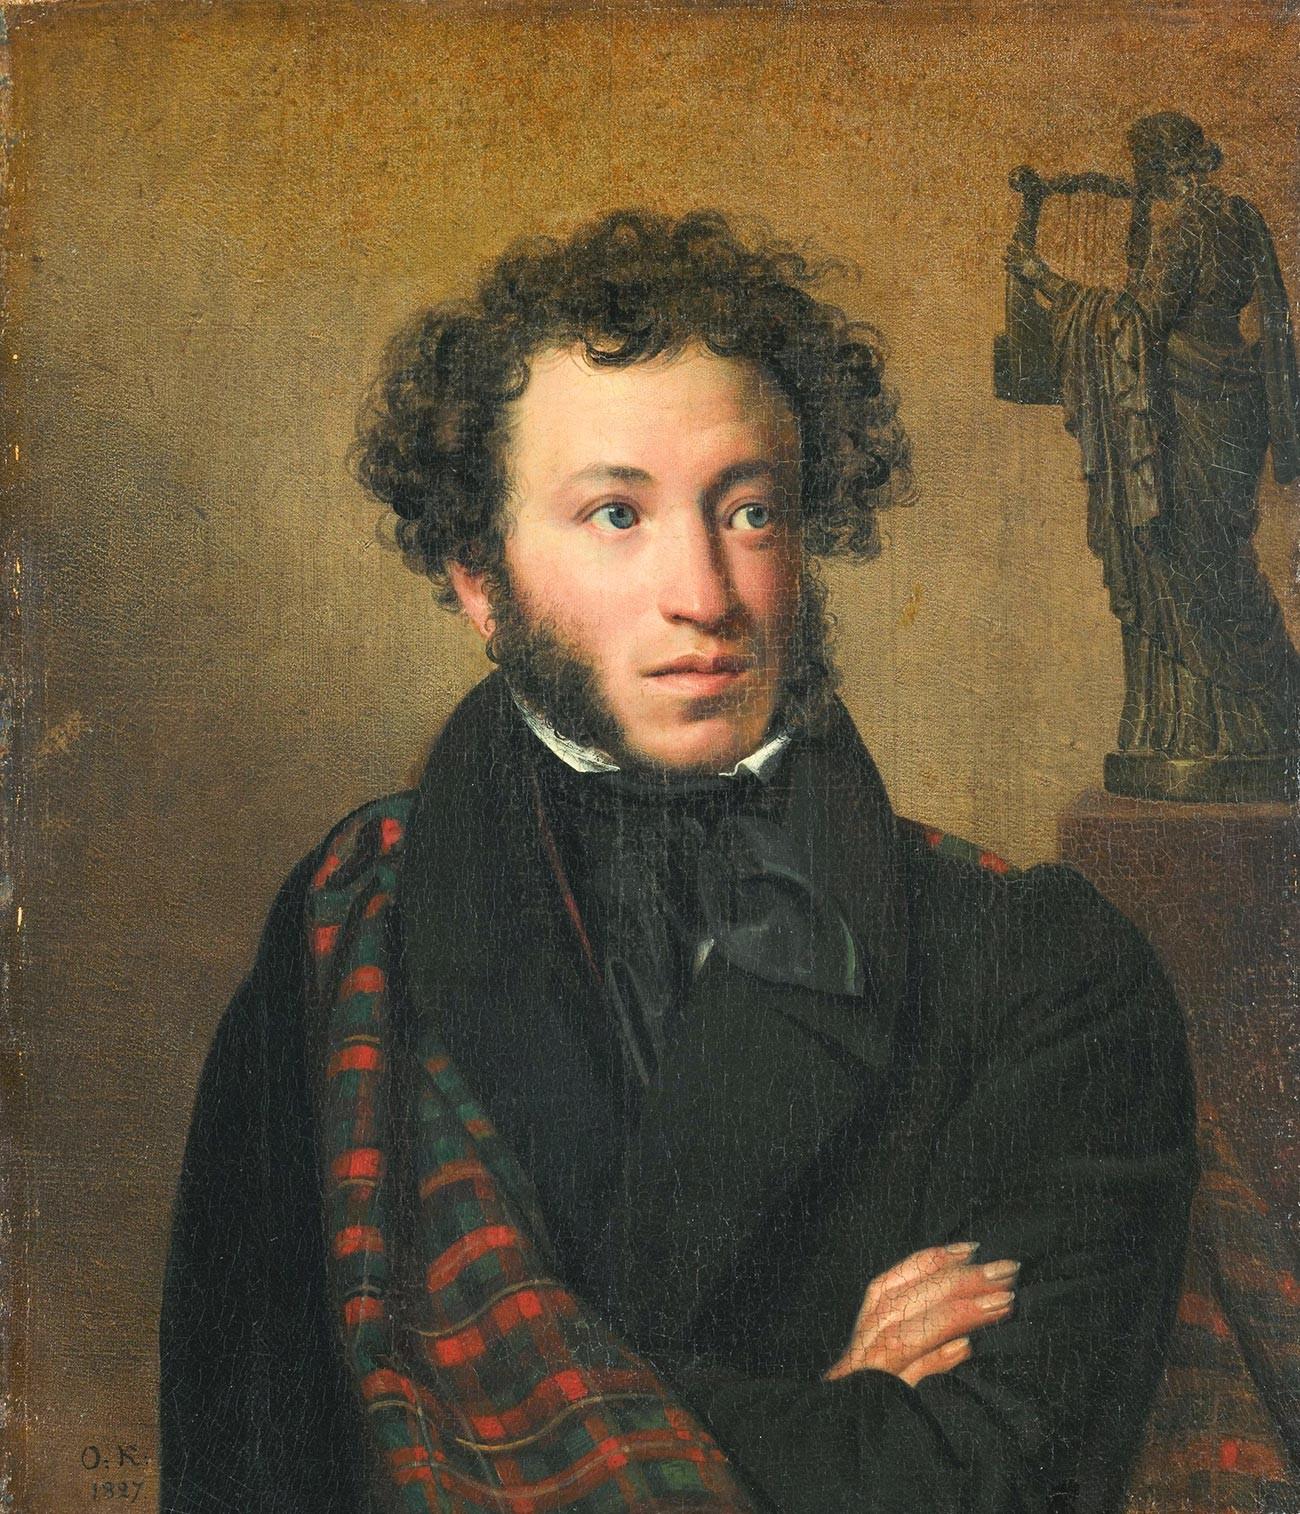 Portrait of Alexander Pushkin, by Orest Kiprensky.